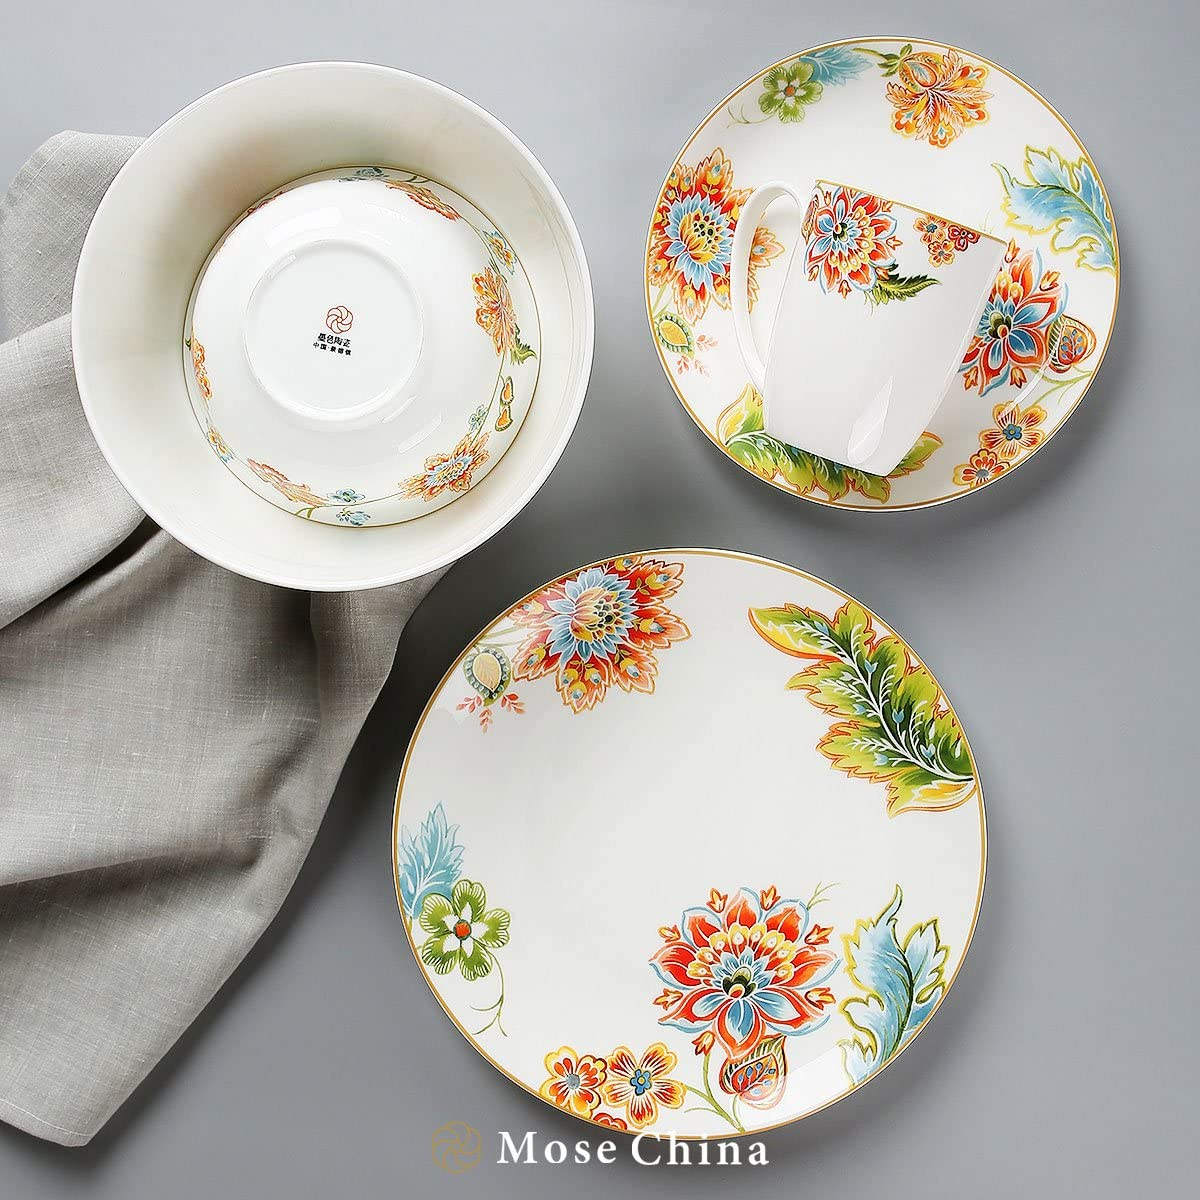 Mose China 6 - Piece Premium Bone China Porcelain Dinnerware Set